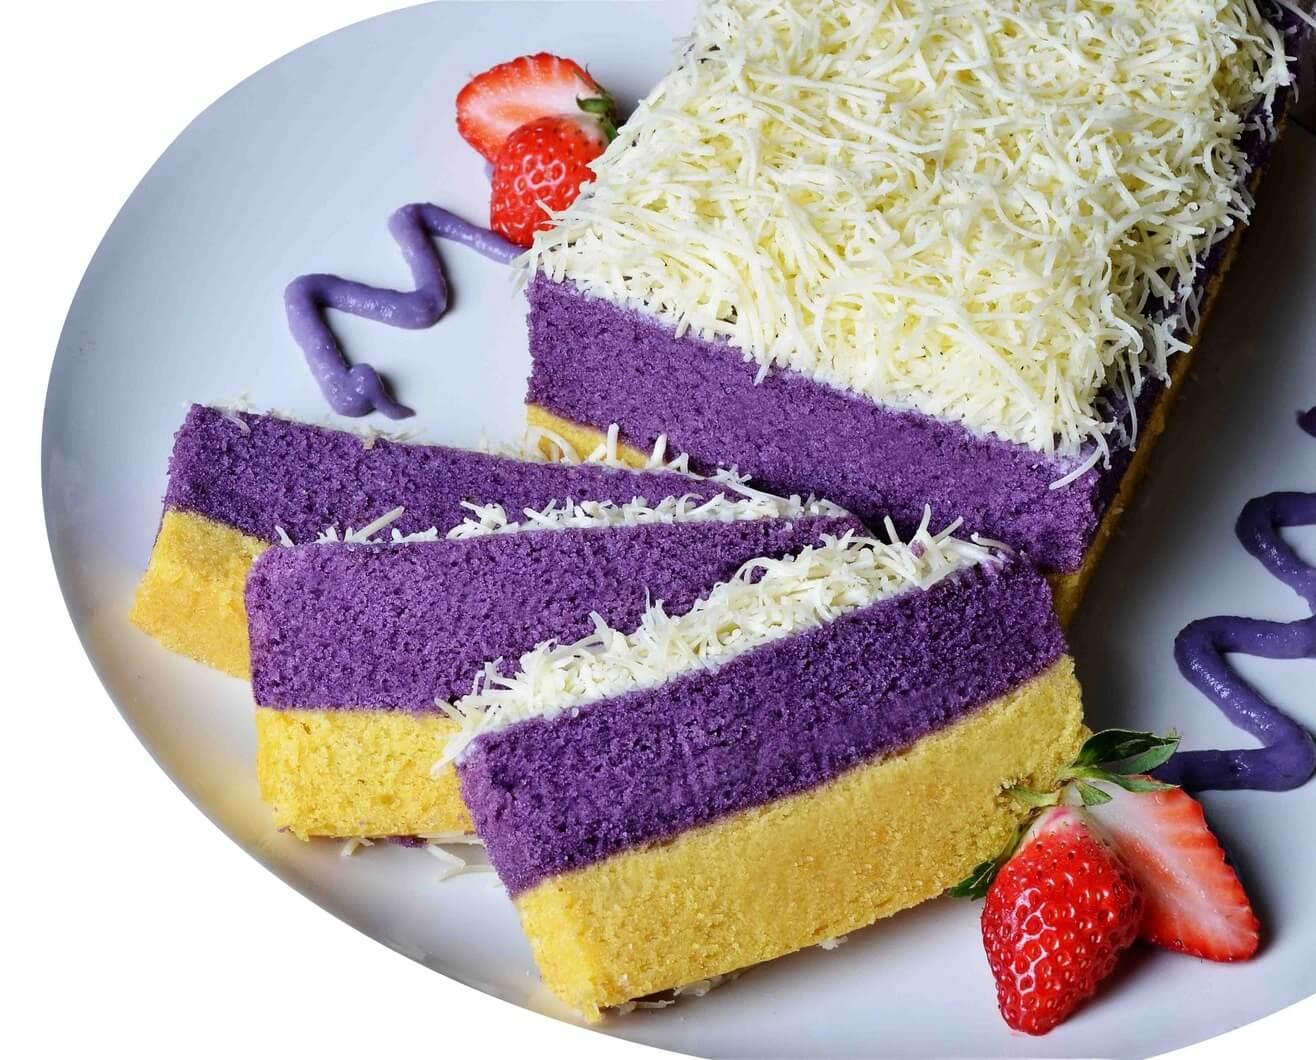 Resep Cake Kukus Untuk Bayi: Kue Lapis Talas, Santapan Legit Khas Bogor